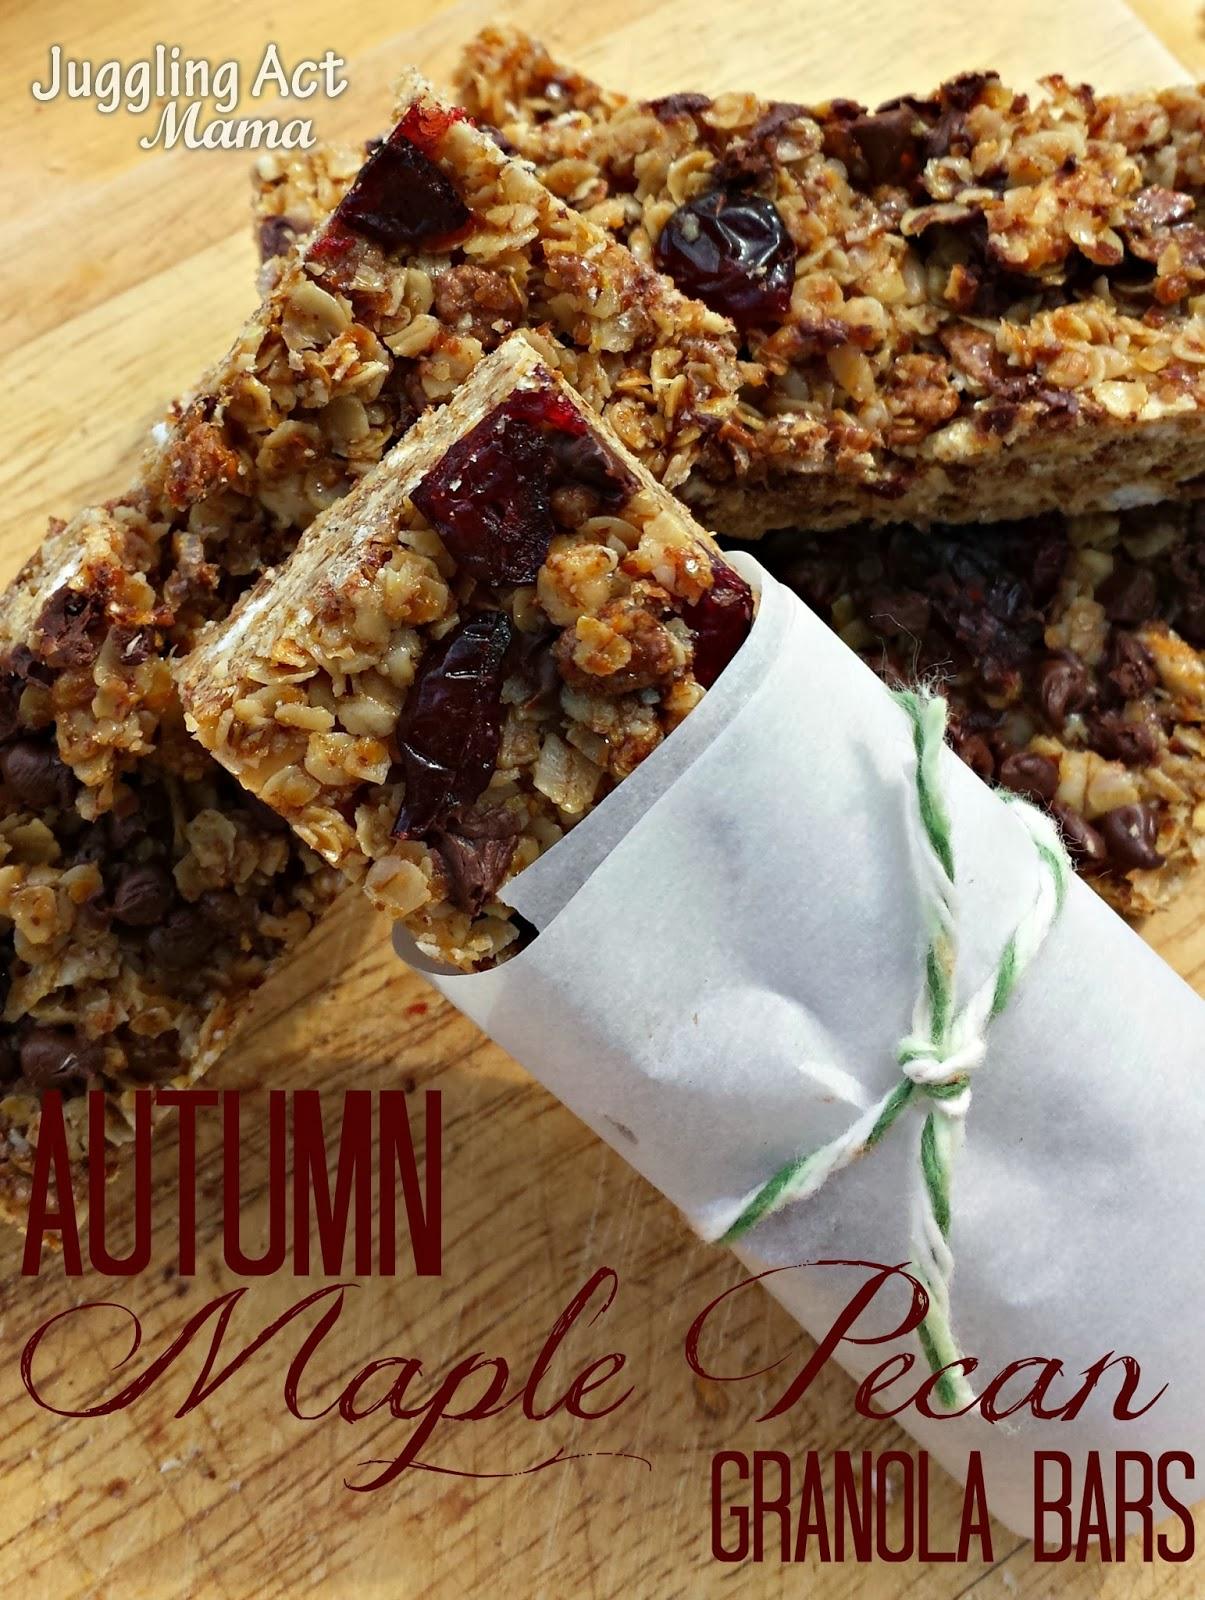 Autumn Maple Pecan Granola Bars - Juggling Act Mama